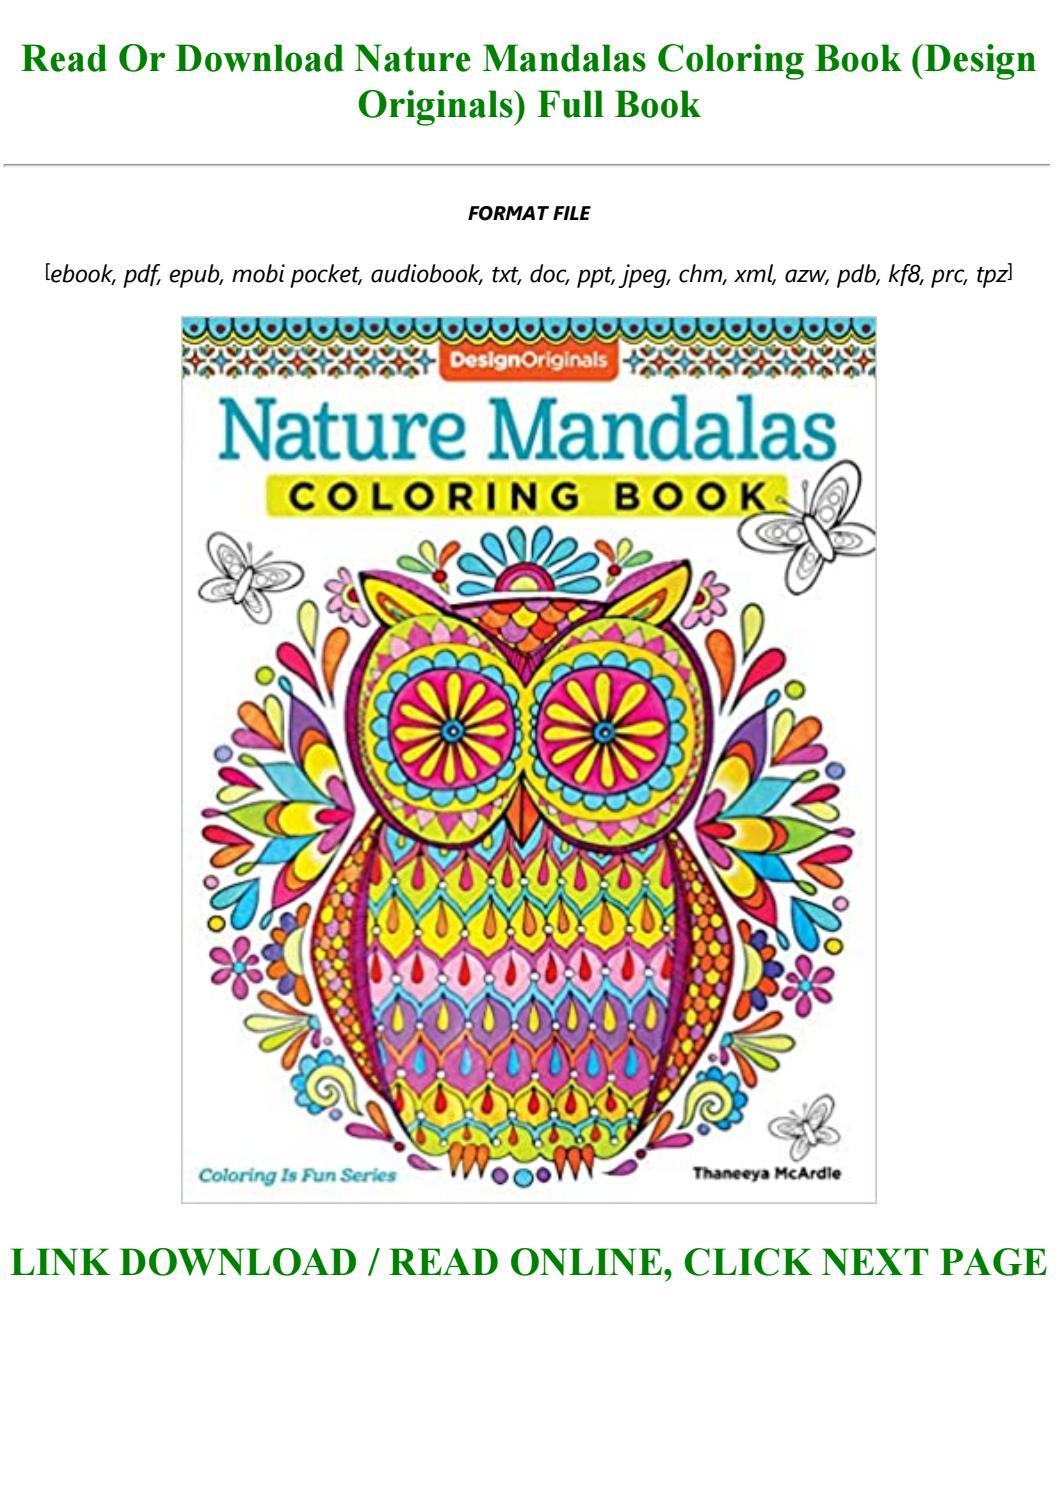 Read Pdf Nature Mandalas Coloring Book Design Originals Full Pdf Online By Garrettbradford1997 Issuu